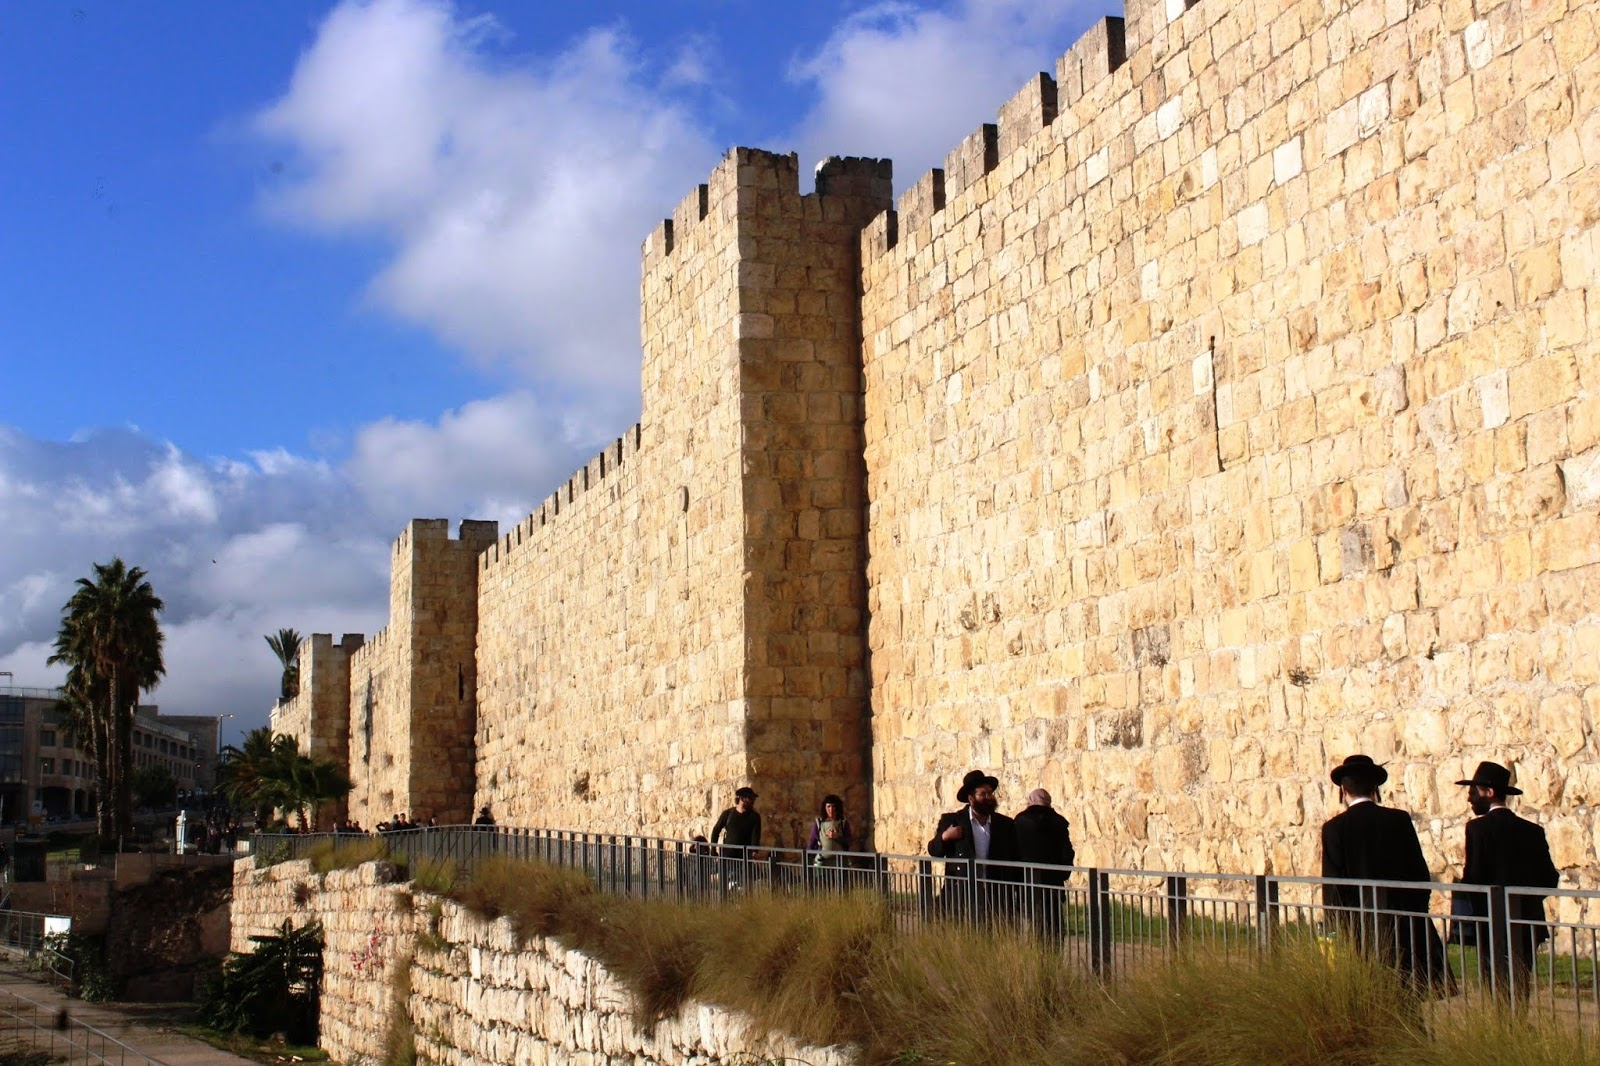 mura citta vecchia gerusalemma israele